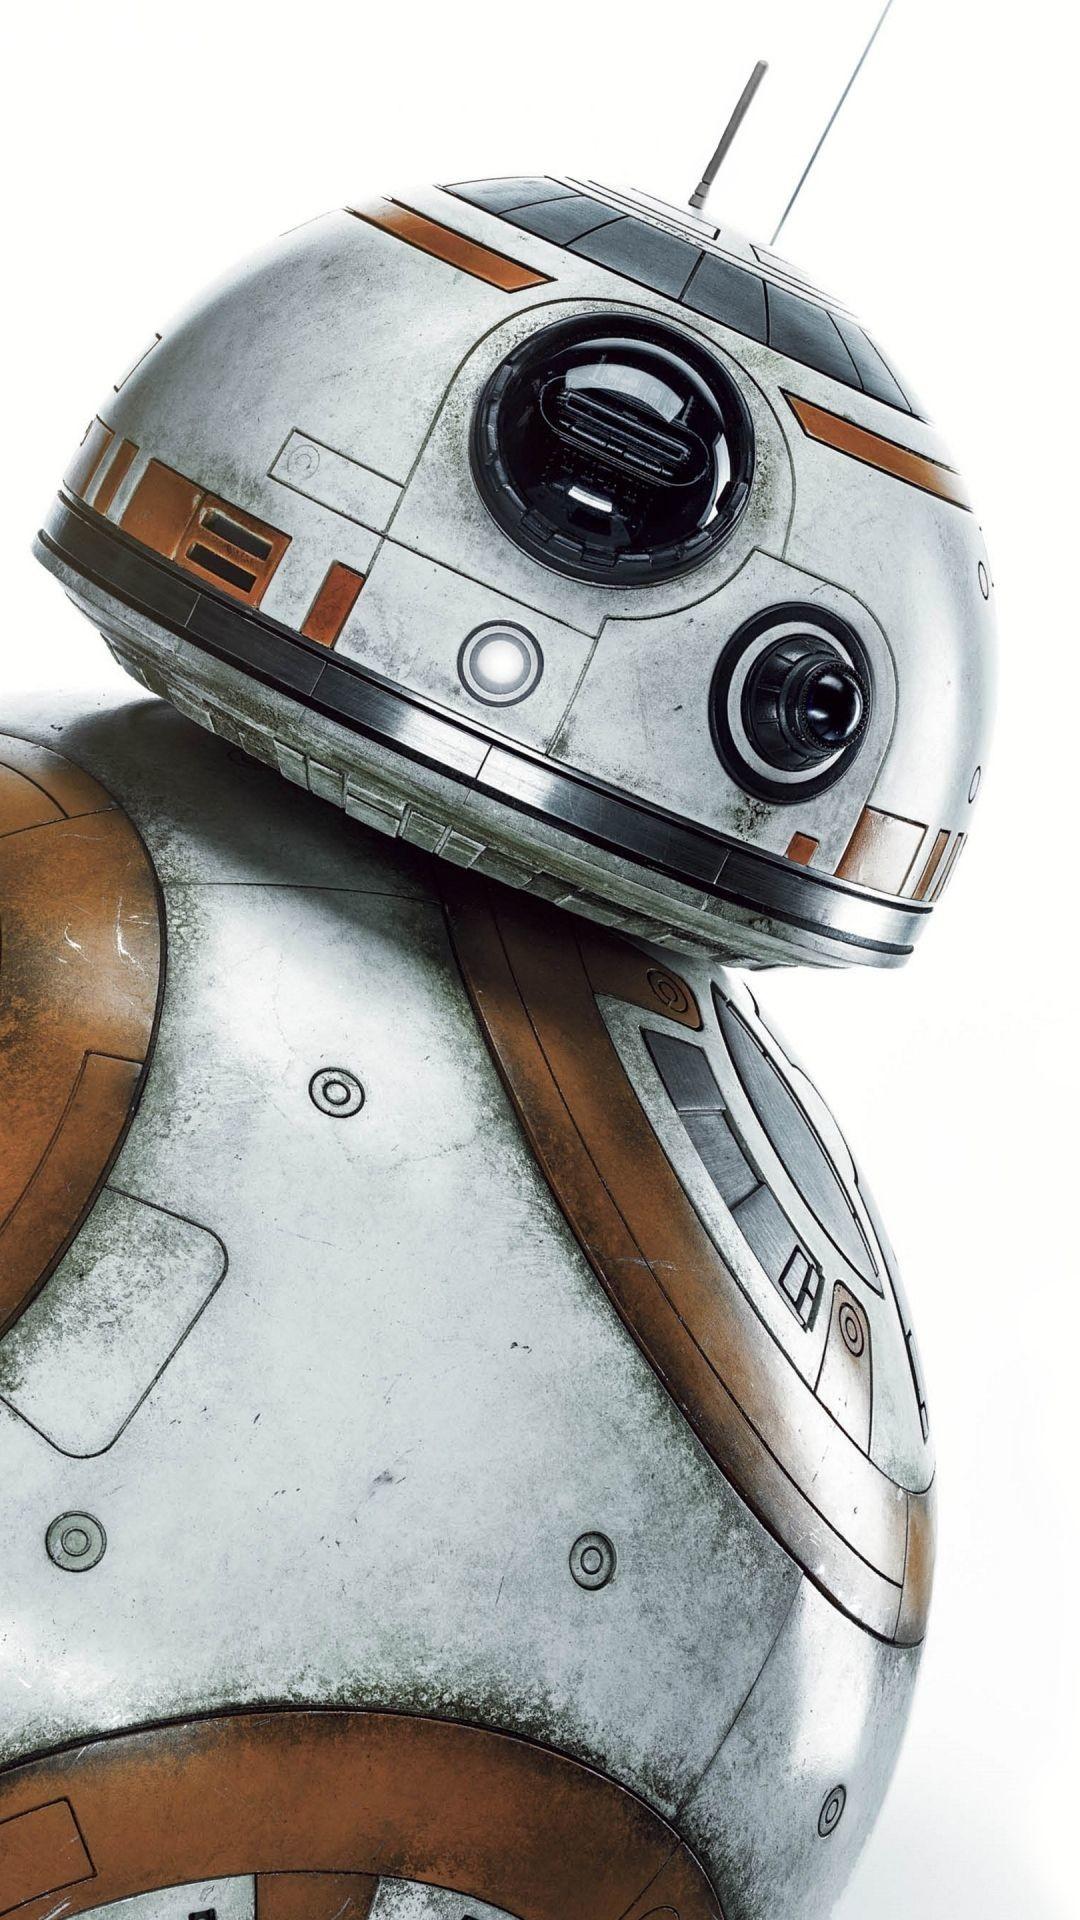 Android Star Wars Phone Wallpaper 4k